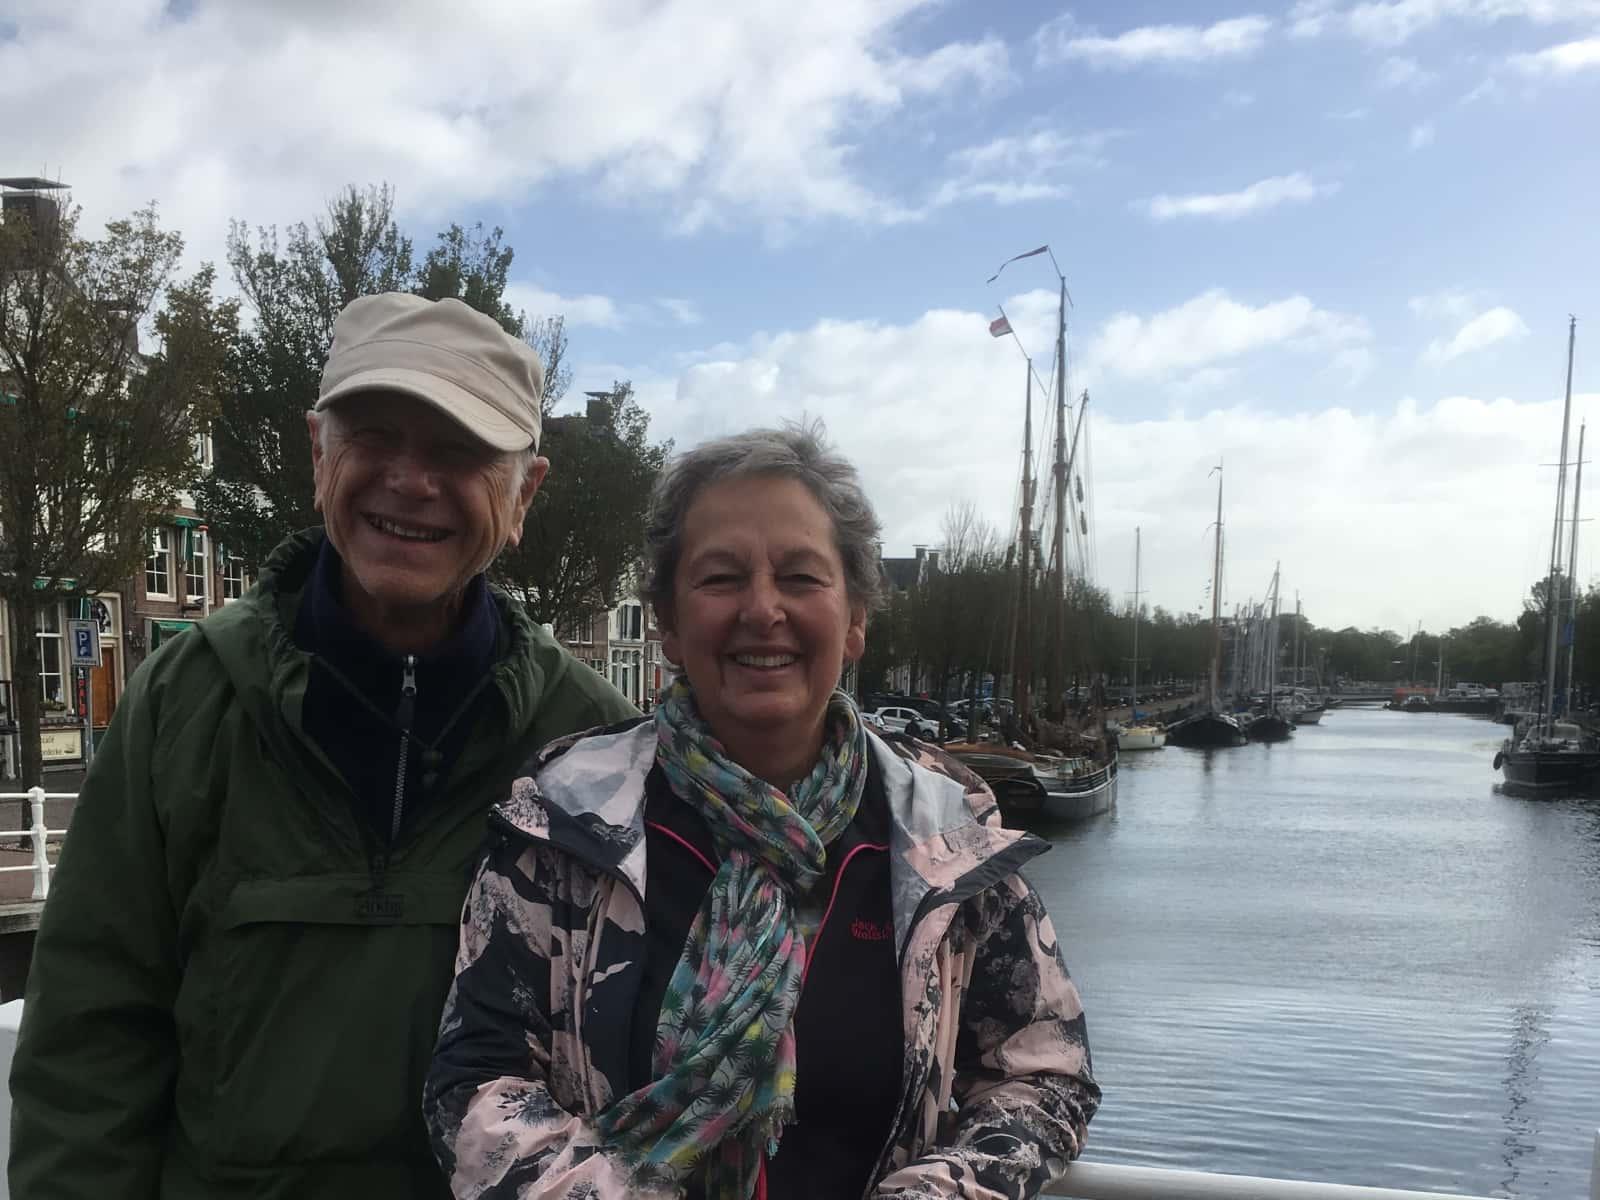 Marian & Paul from Falmouth, United Kingdom